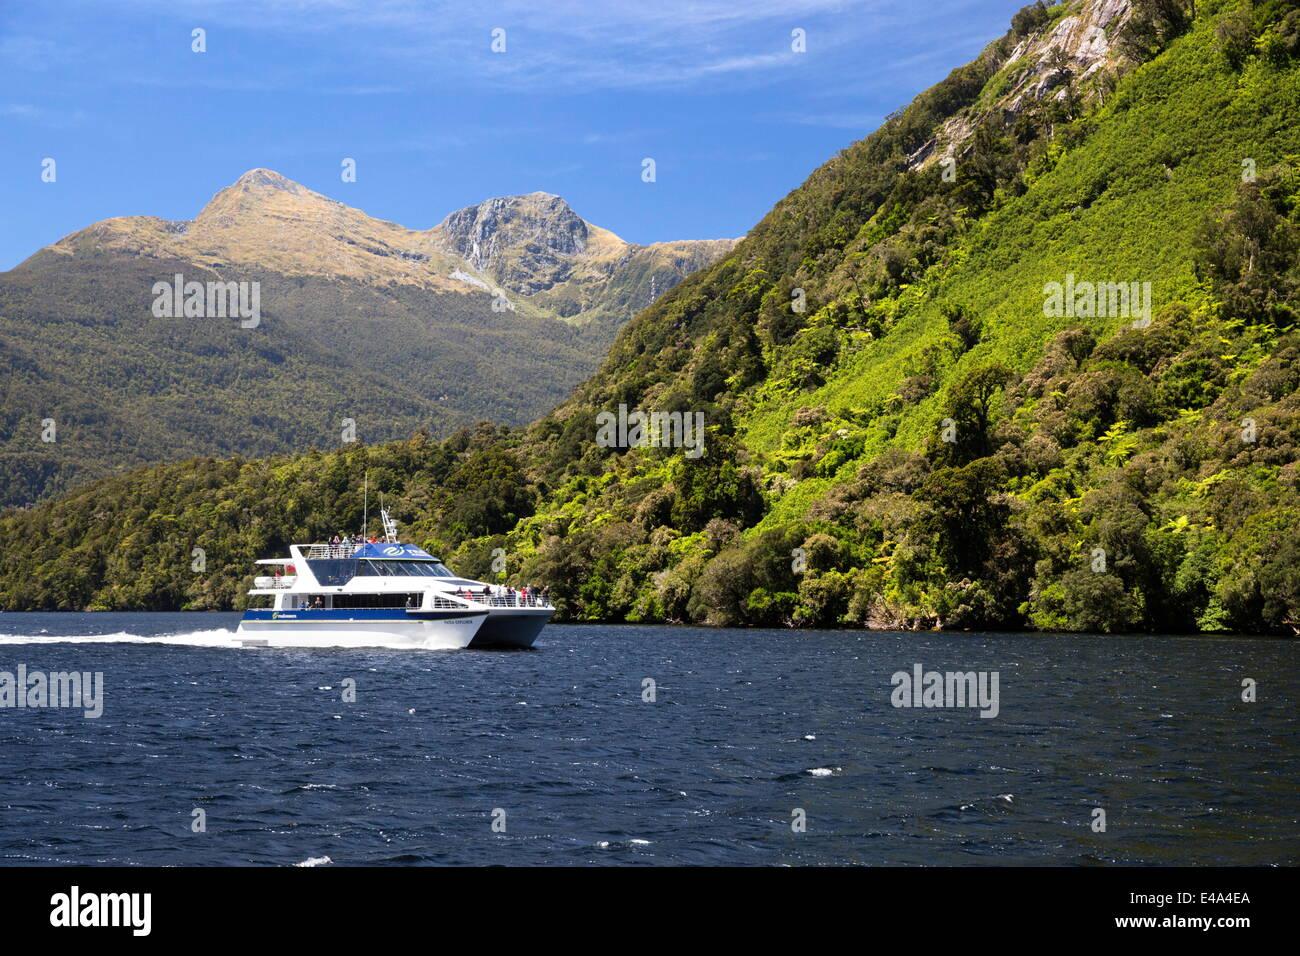 Patea Explorer Kreuzfahrtschiff, Doubtful Sound, Fjordland National Park, UNESCO, Südinsel, Neuseeland, Pazifik Stockbild